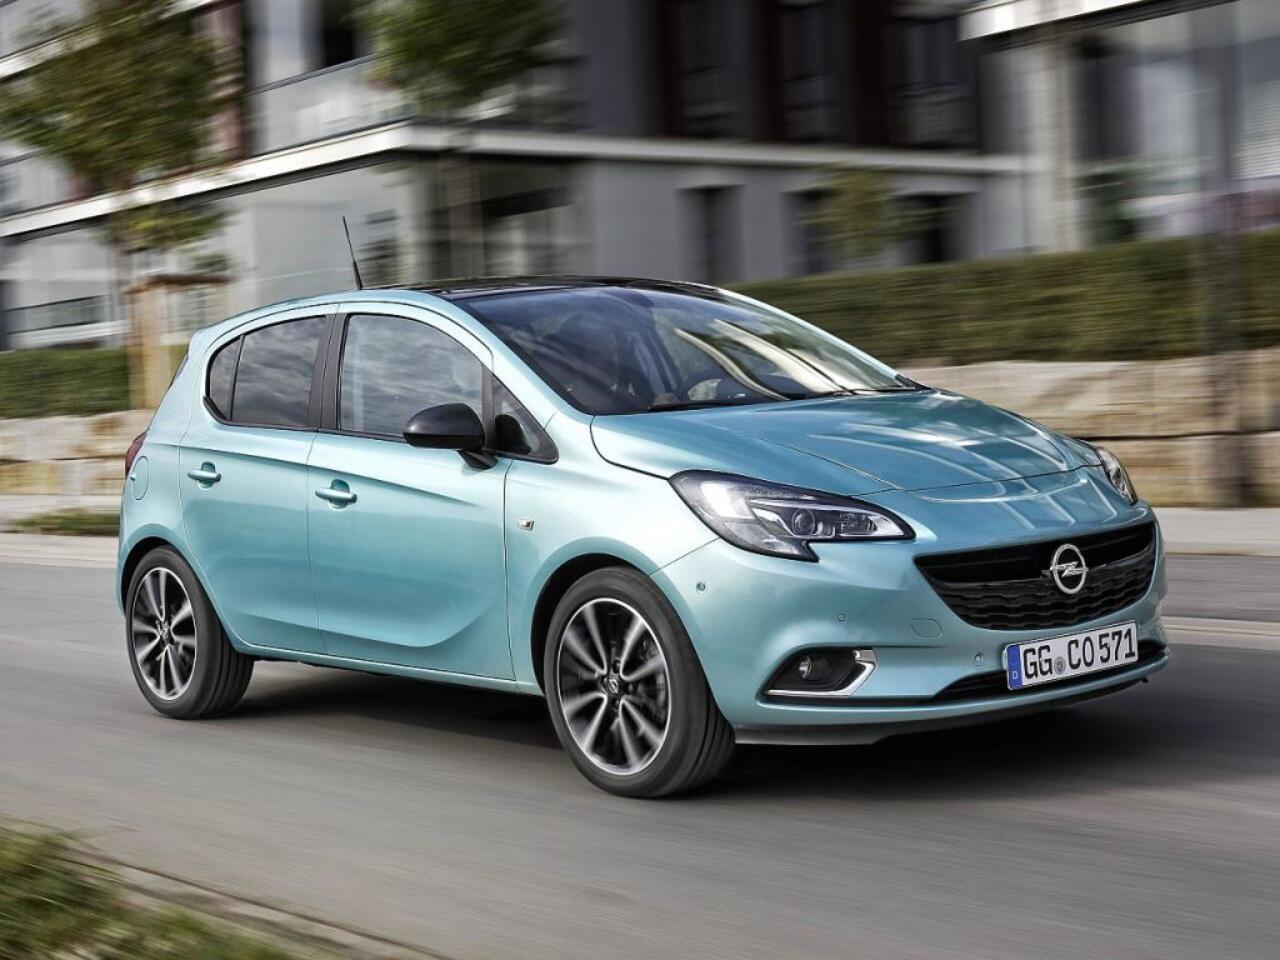 Bild zu Platz 11: Opel Corsa